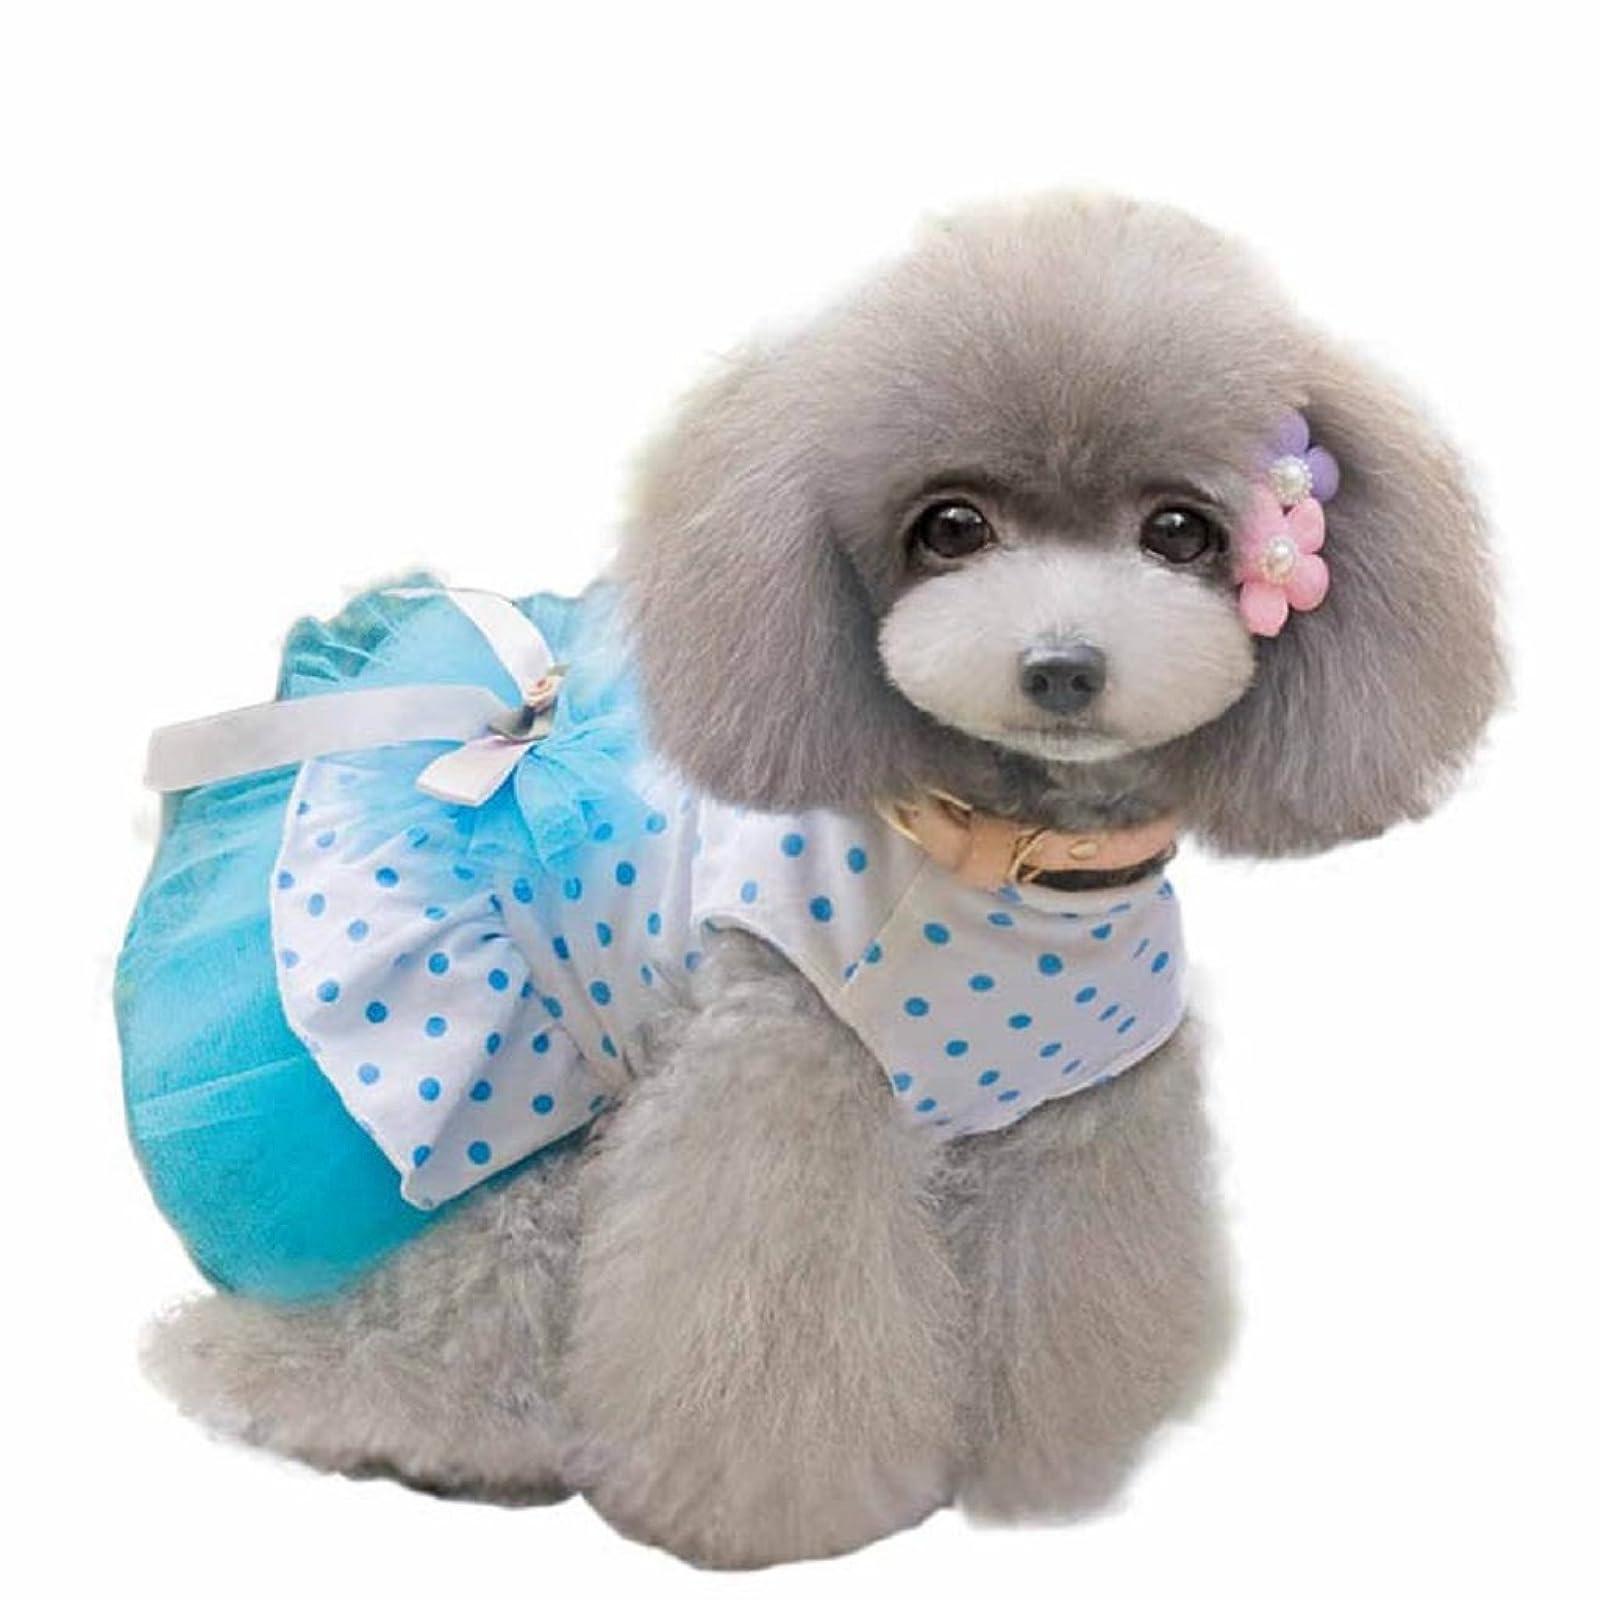 HP95(TM) Pet Dog Dress 2015 Romantic Blue L - 3